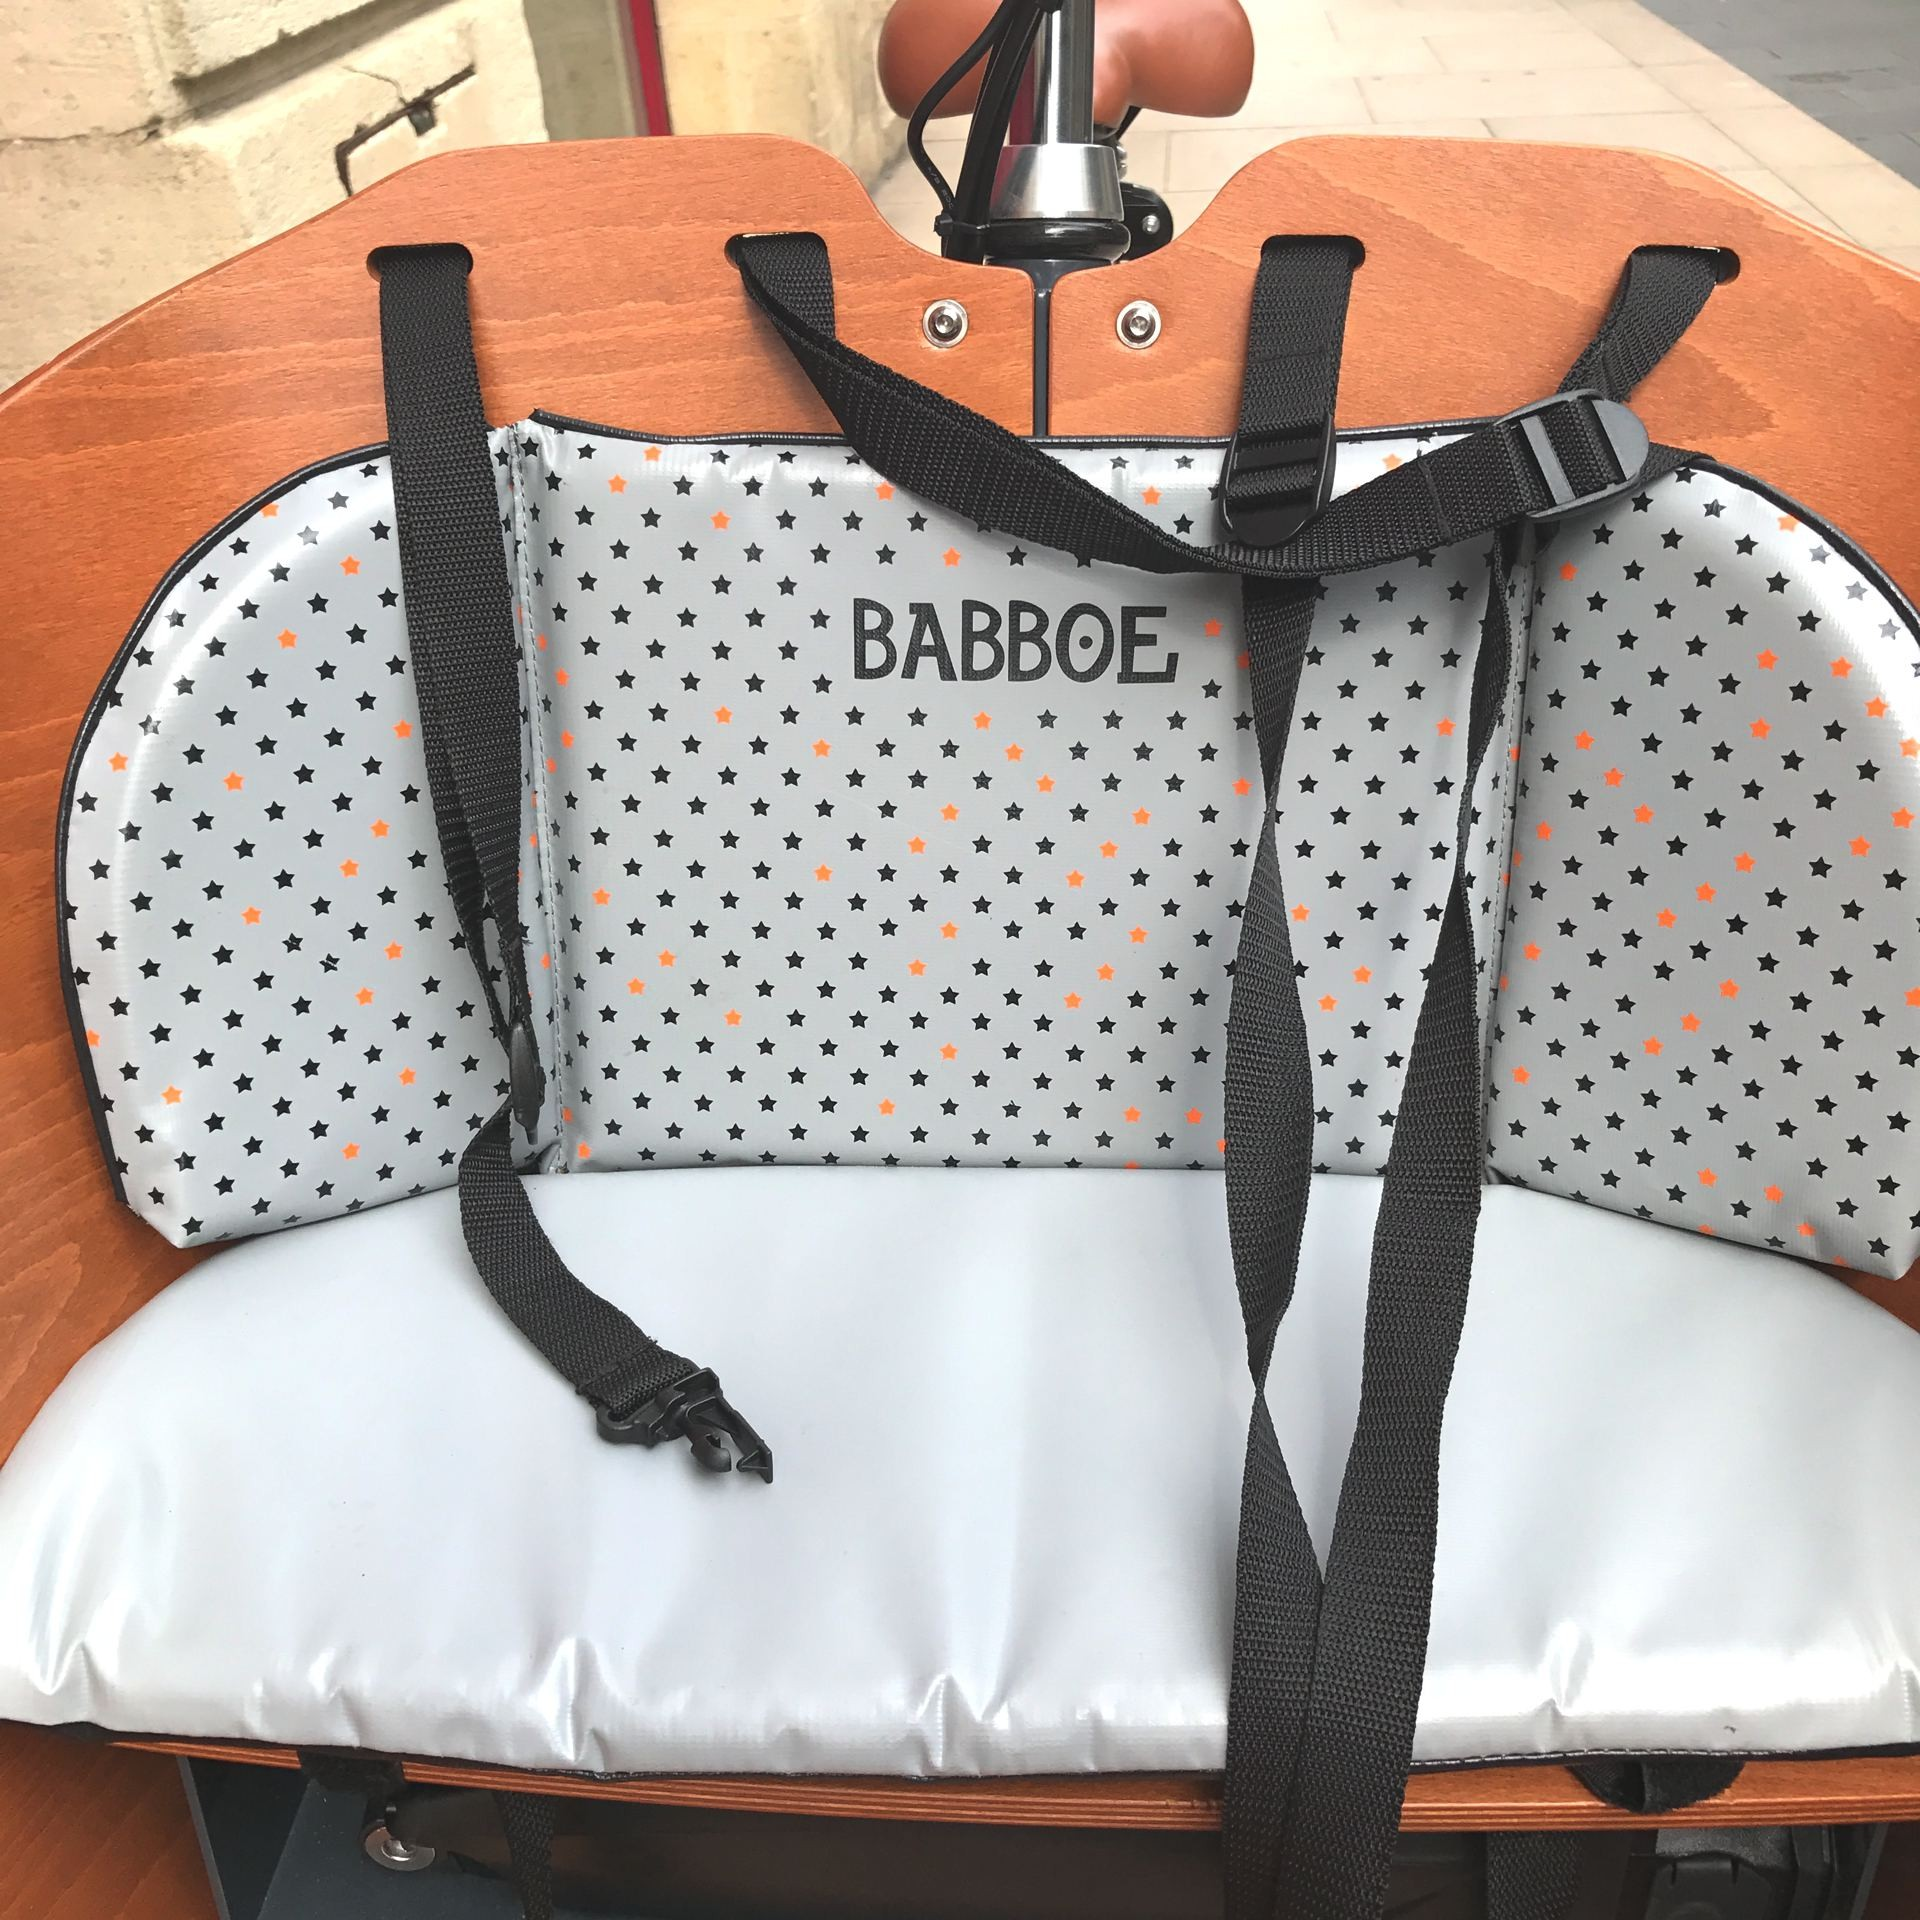 babboe_triporteur_pendulaire_5